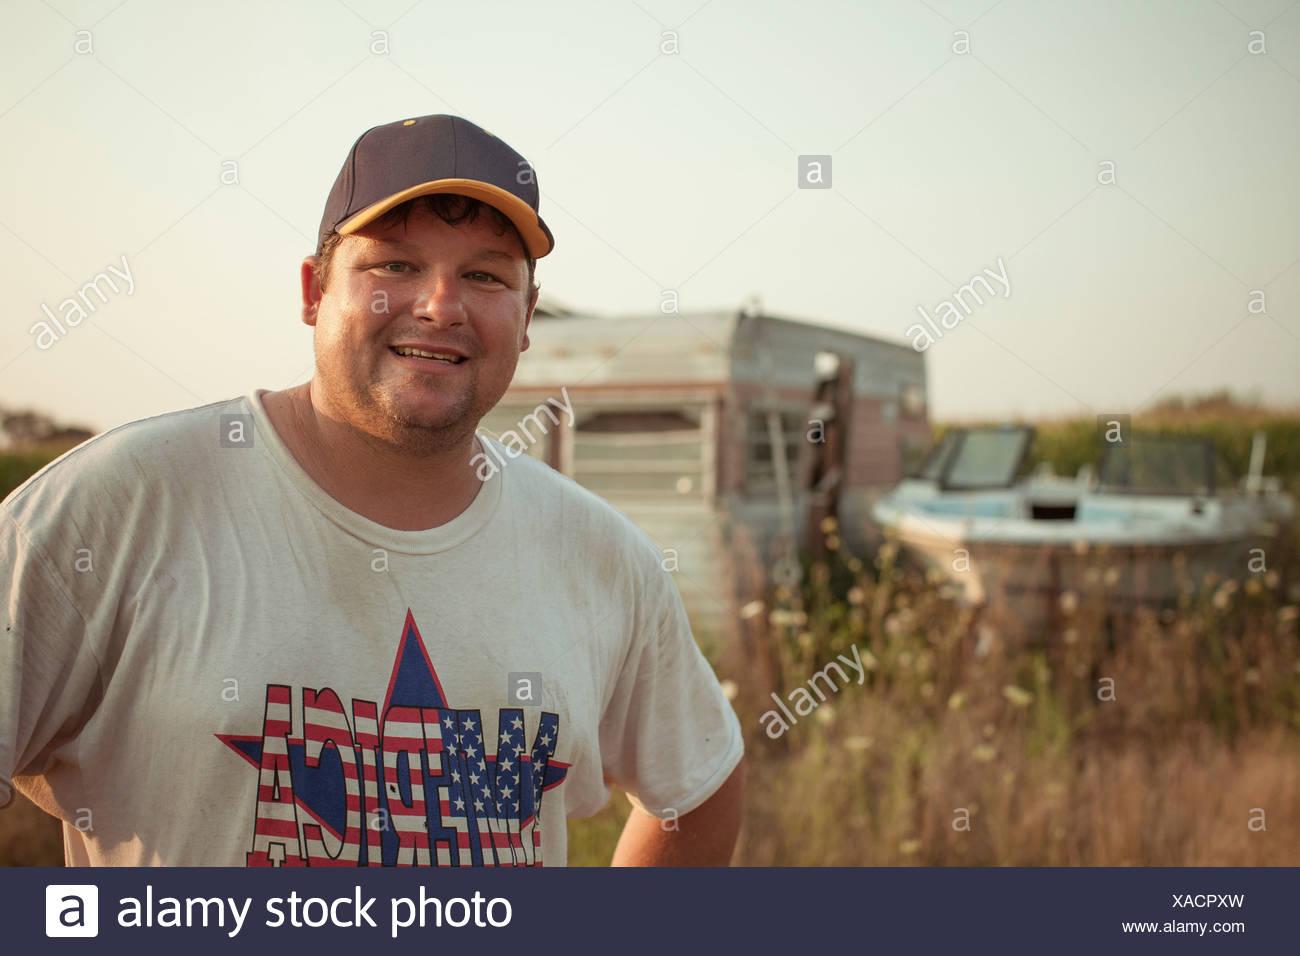 Portrait of man wearing patriotic t shirt - Stock Image